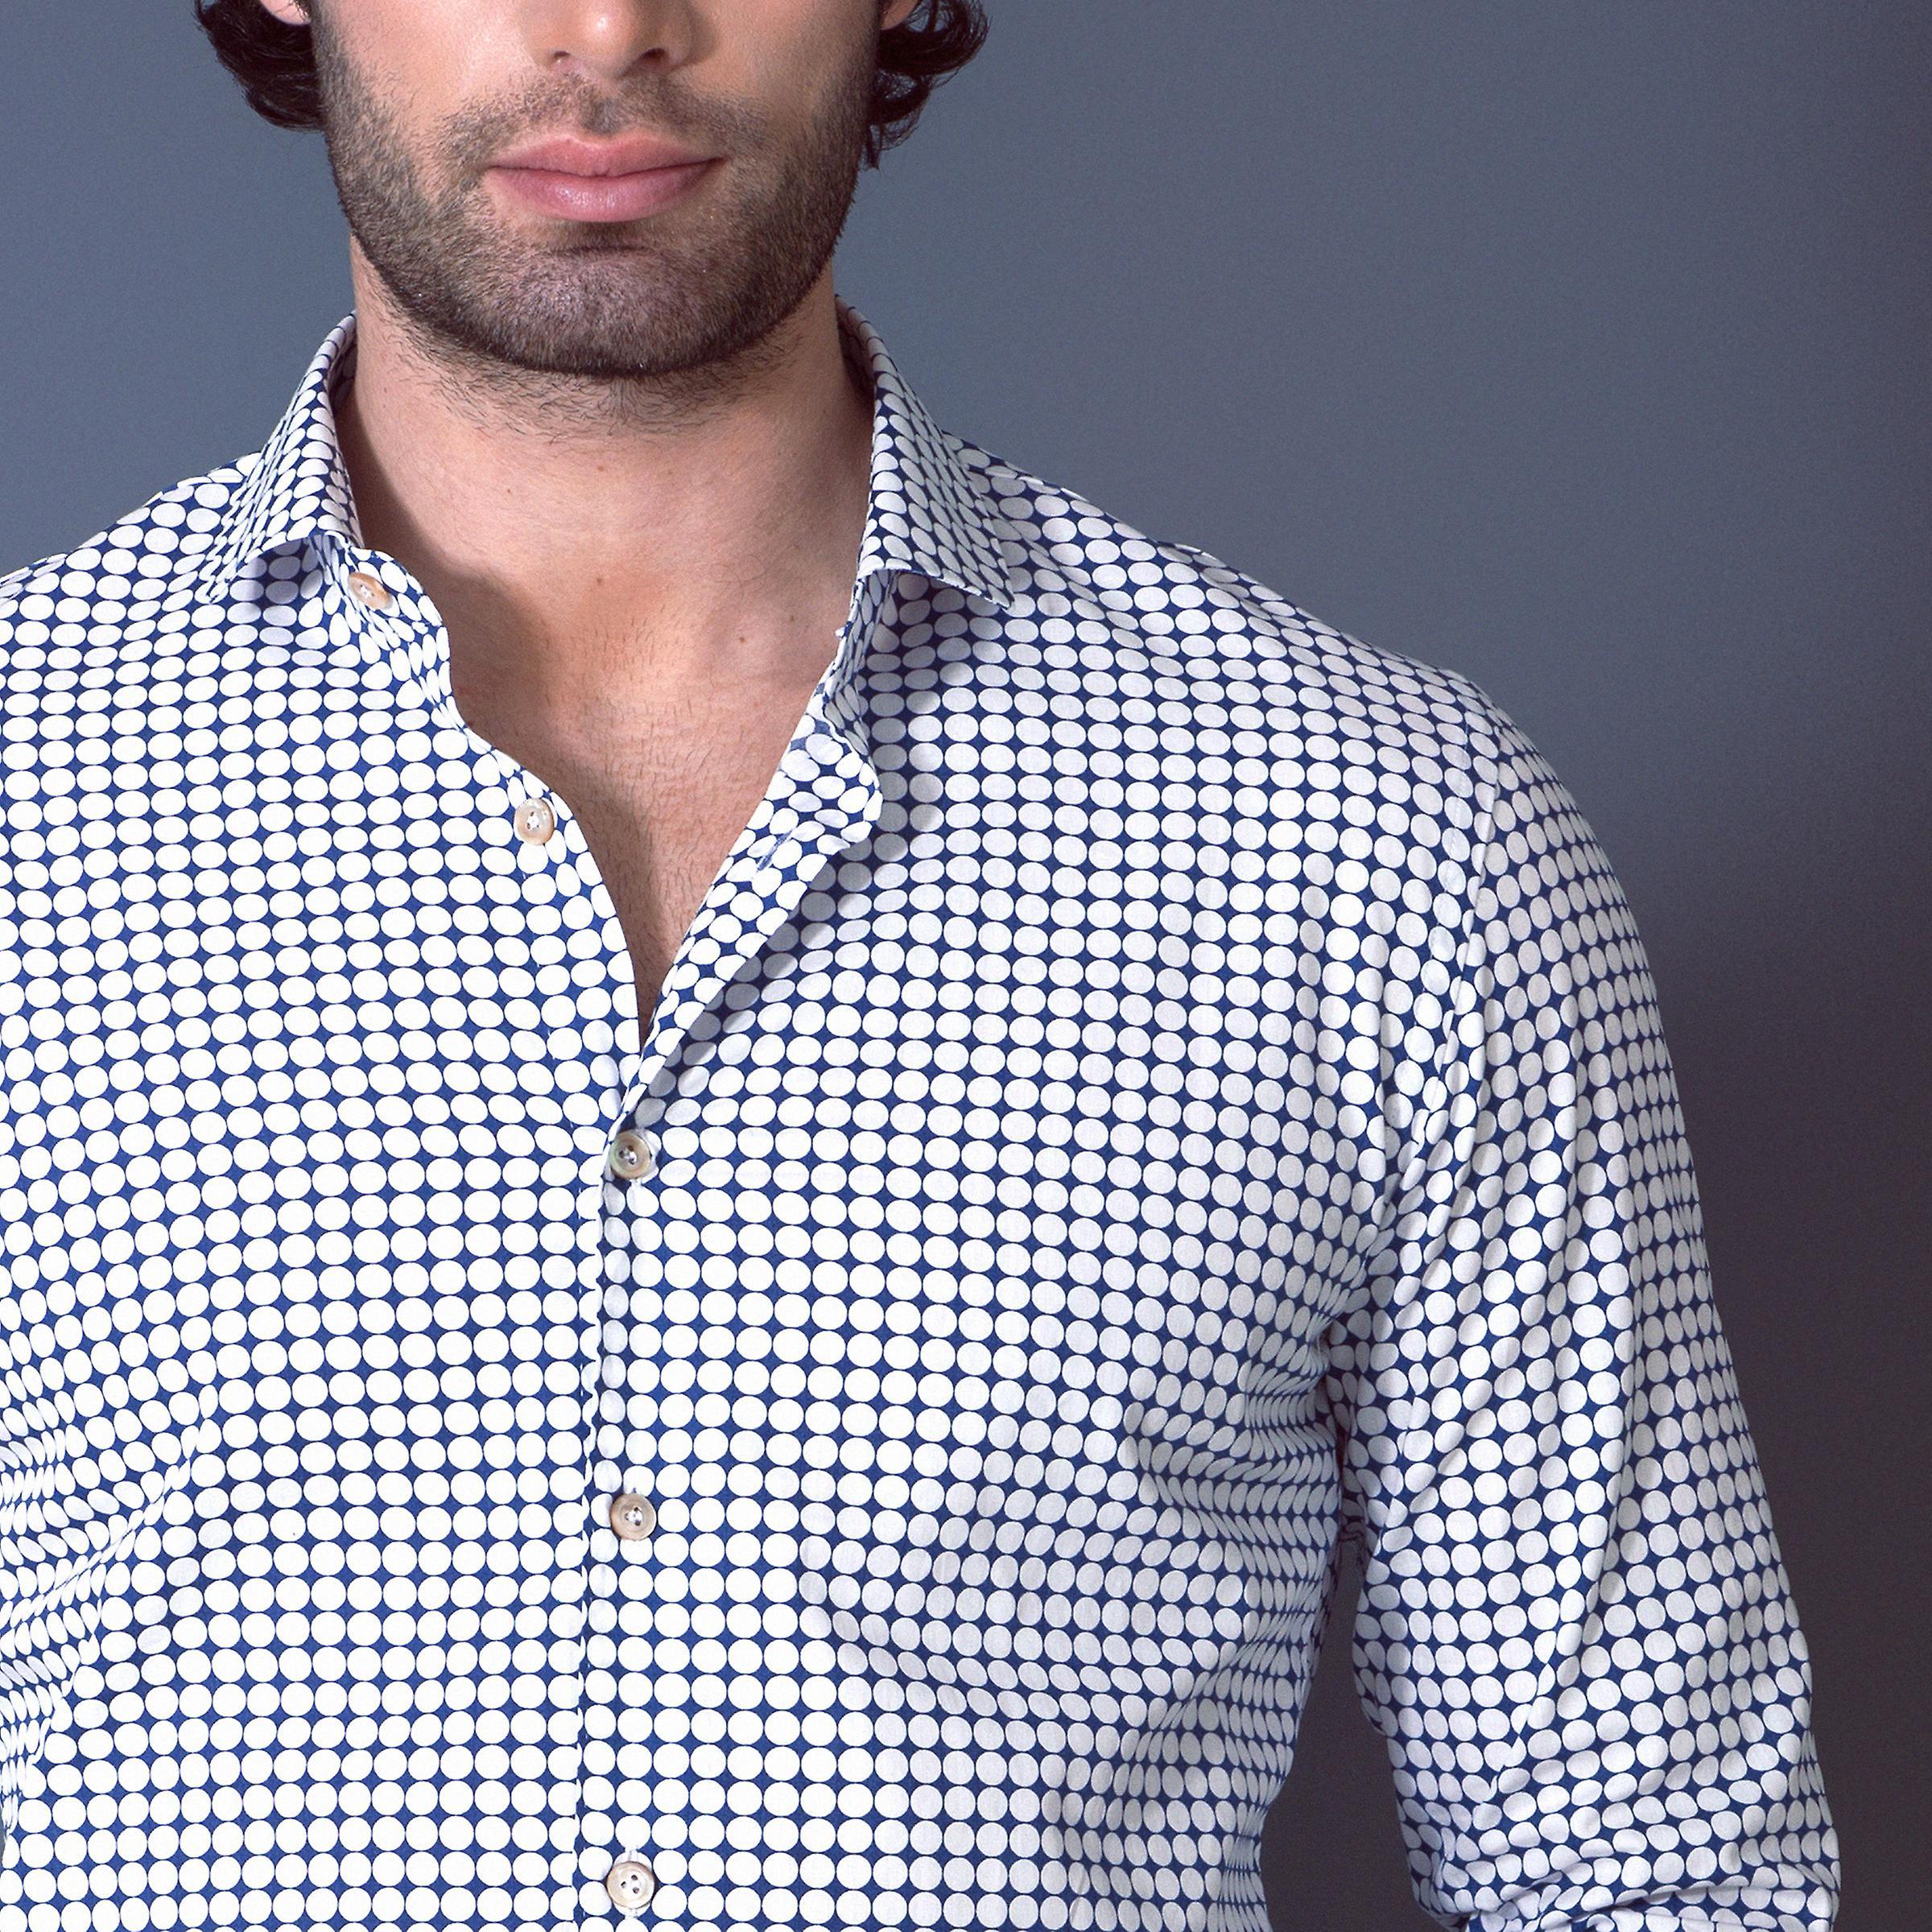 Fabio Giovanni Marsala Shirt - Mens Italian Casual Polka Dot Stylish Shirt - Long Sleeve